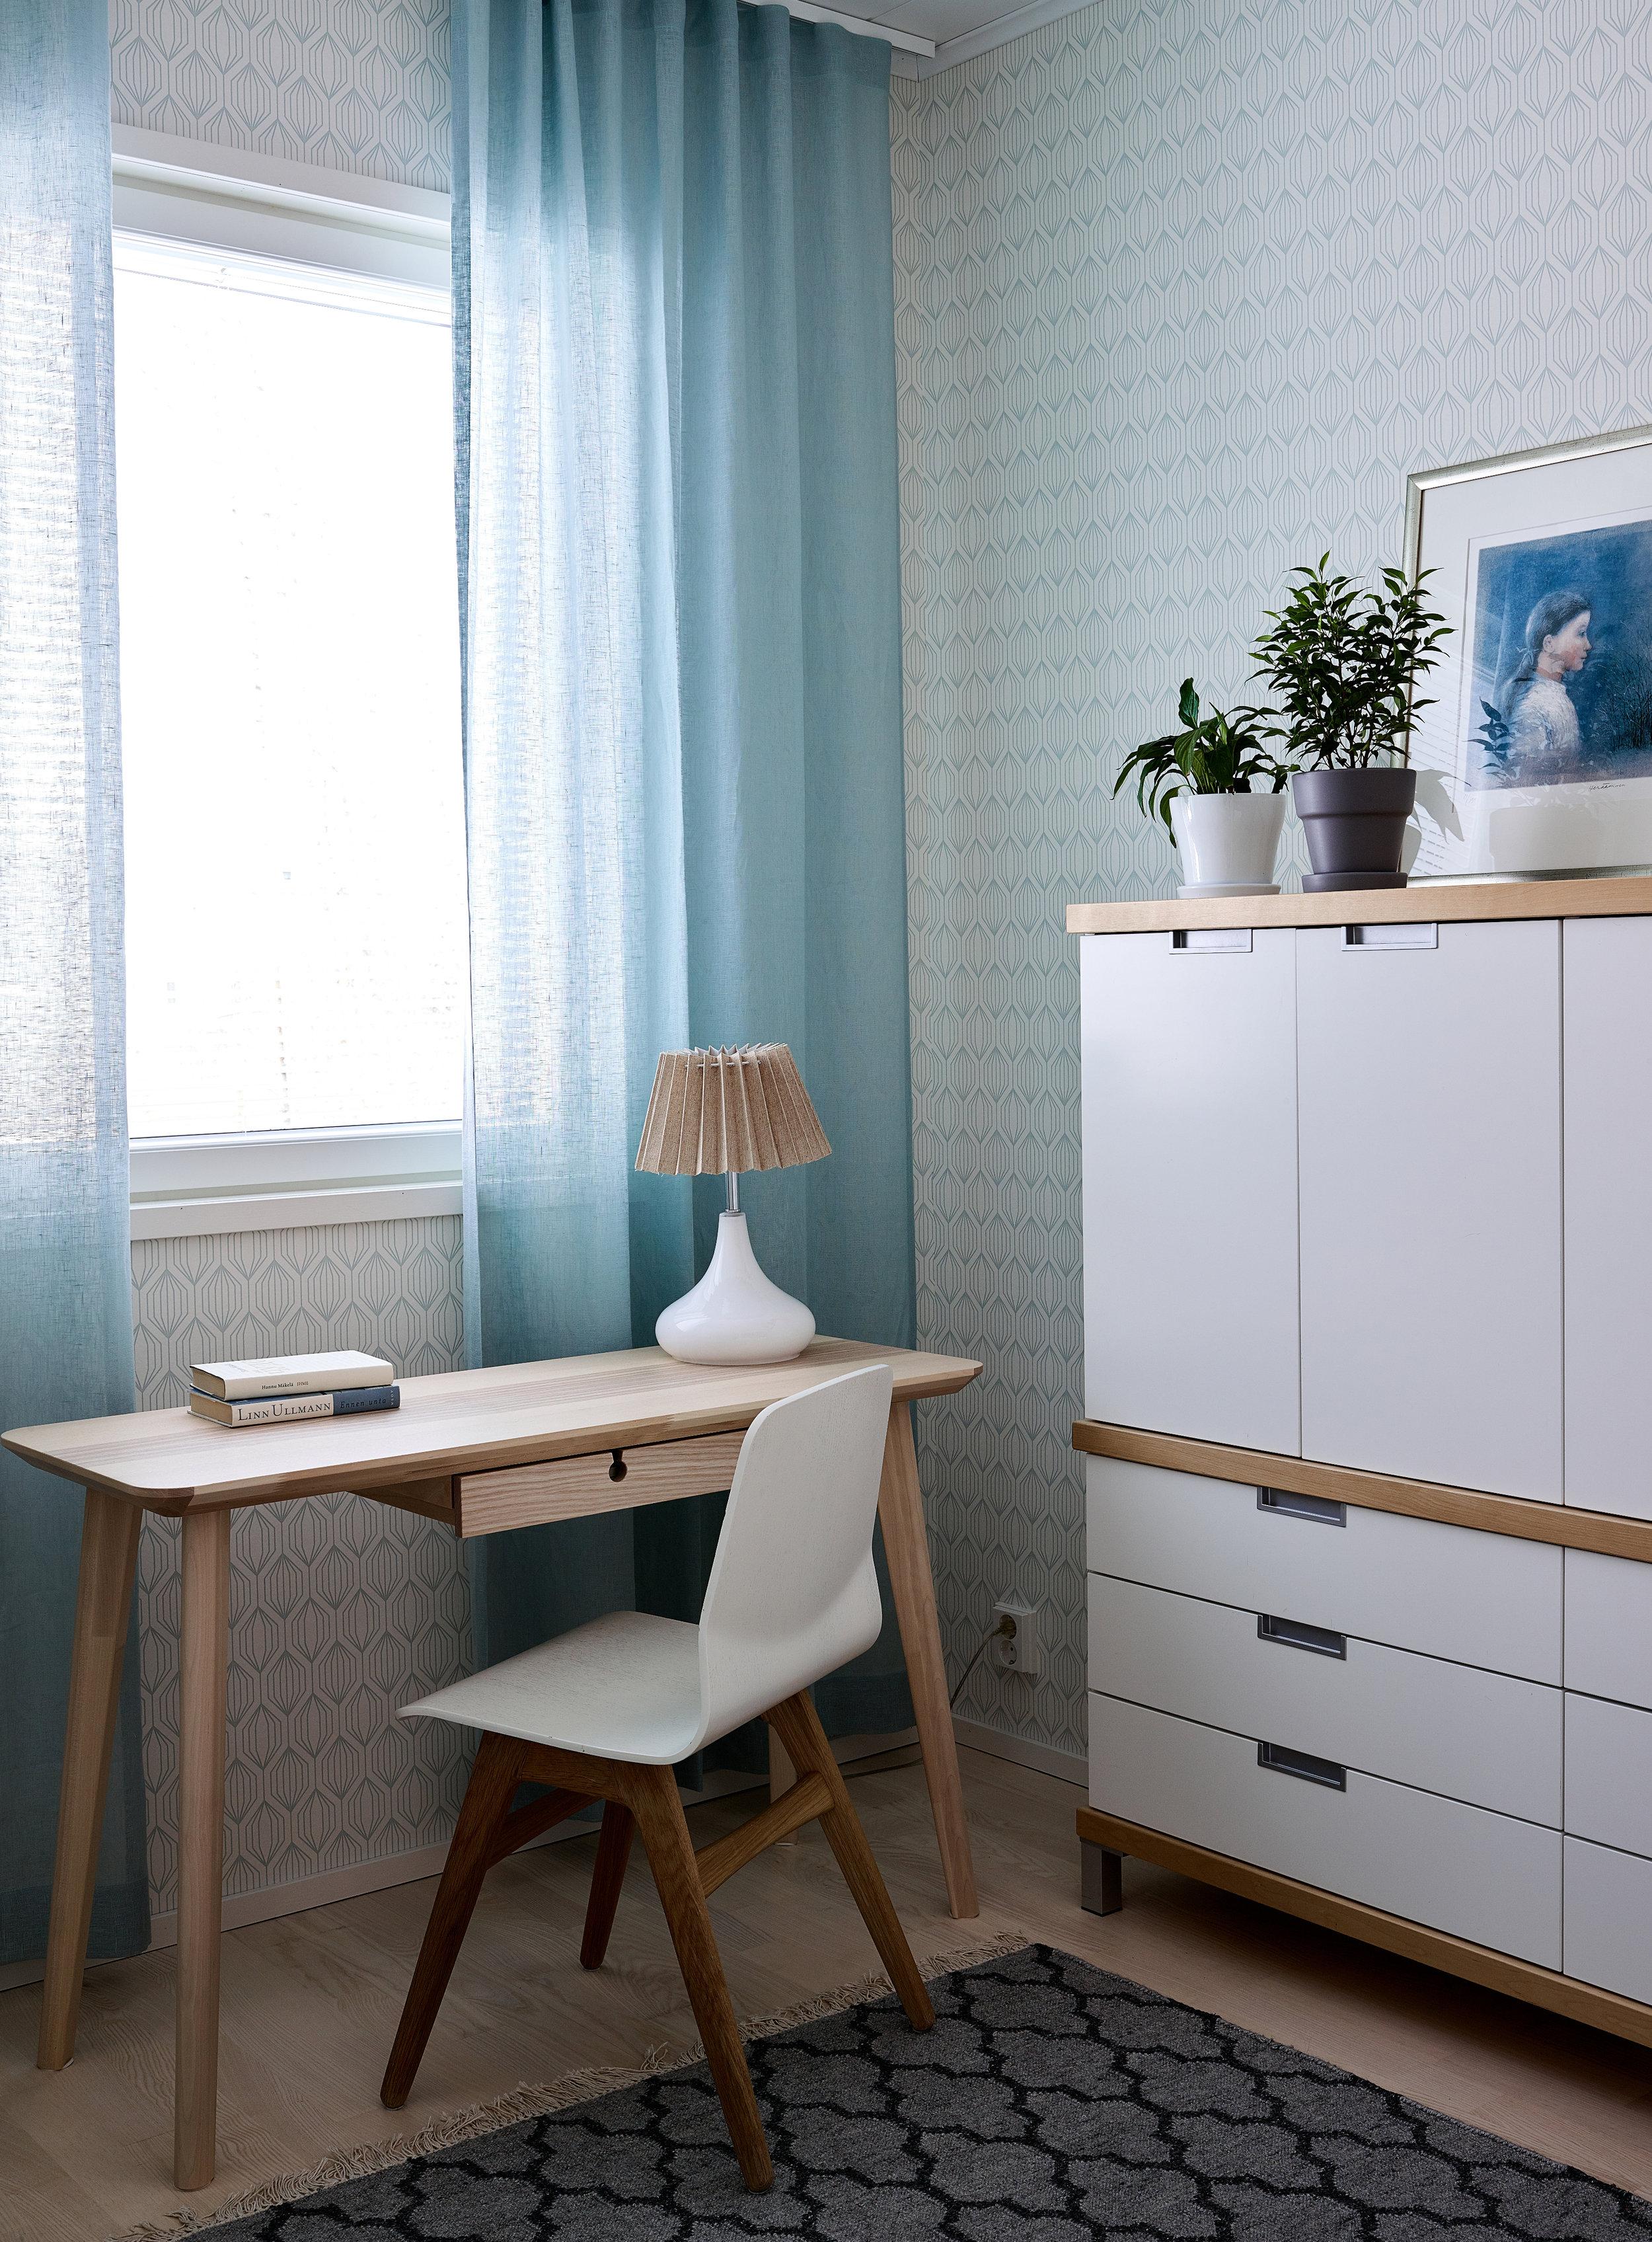 interior-anna-koponen-photo-krista-keltanen-09.jpg